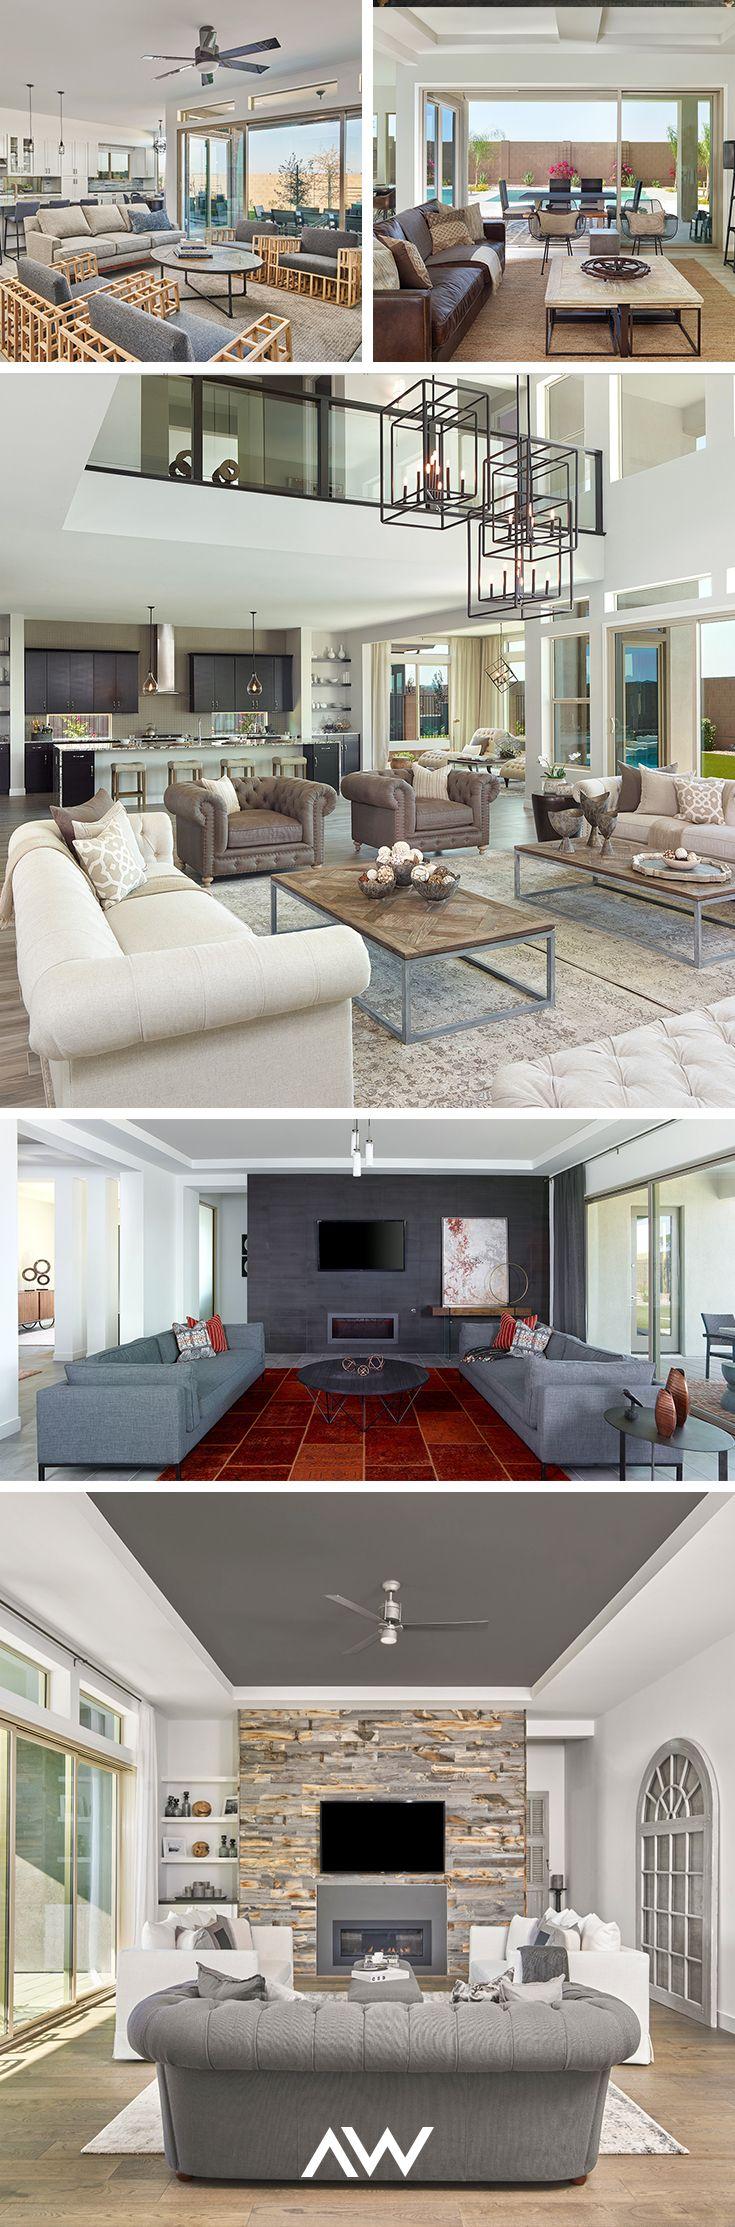 Best Images About Family Rooms Ashton Woods On Pinterest - Phoenix home design